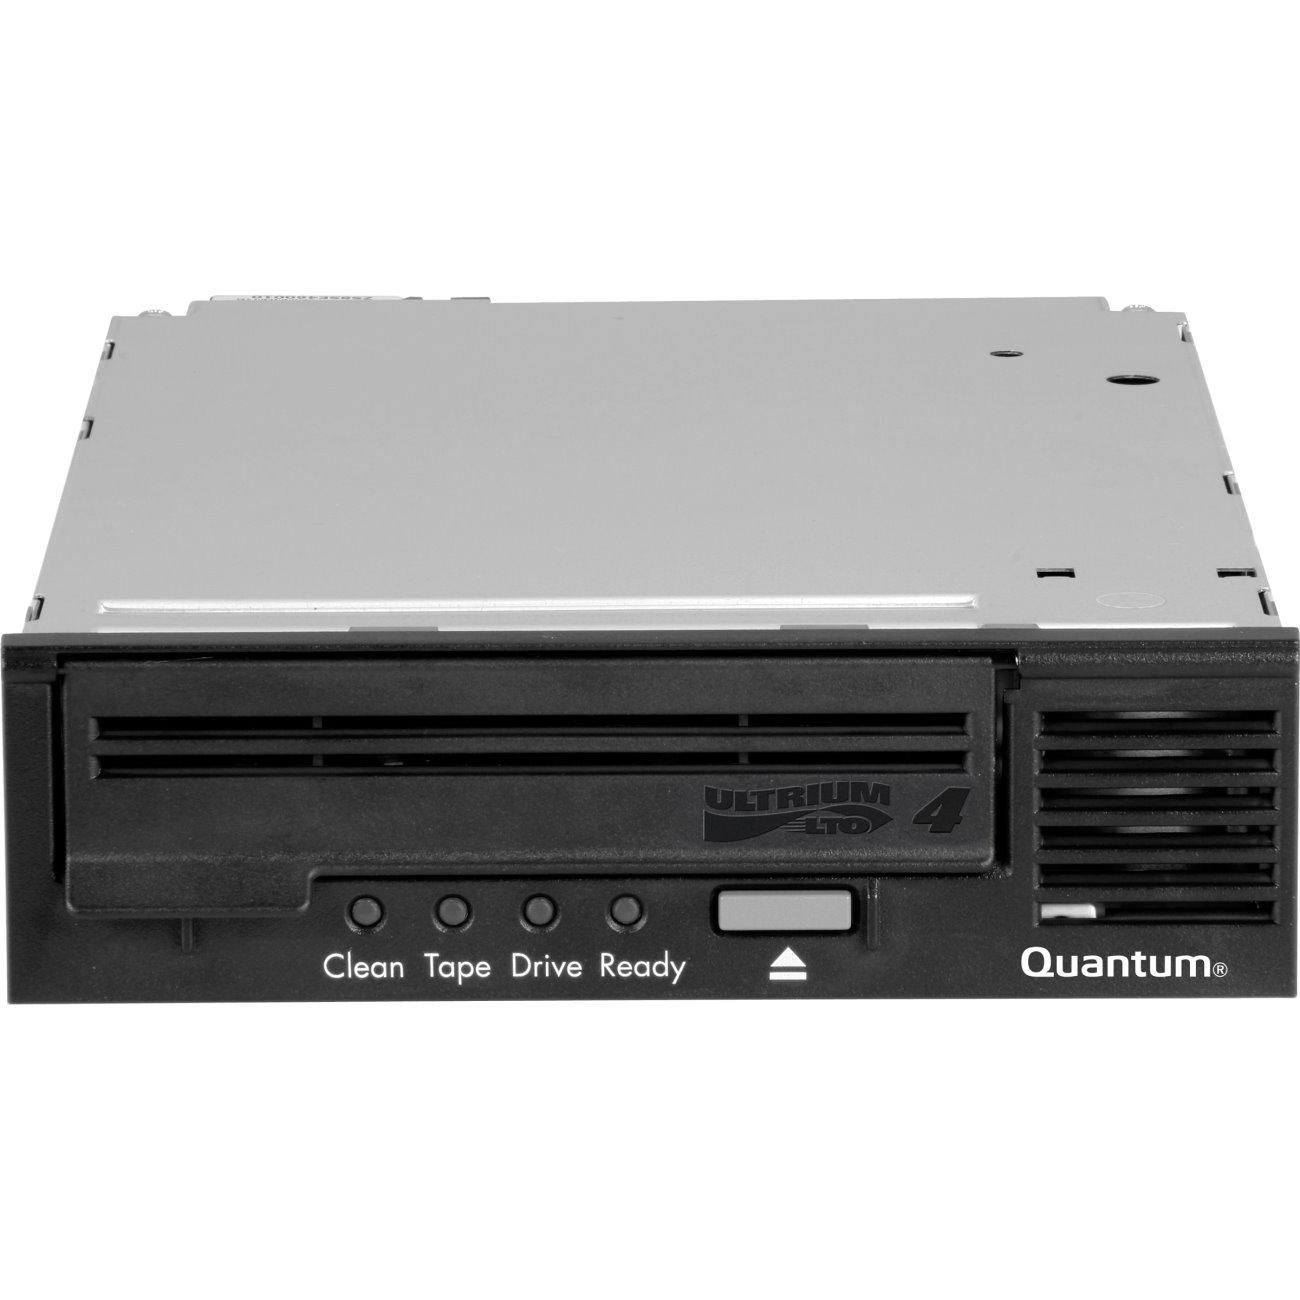 Quantum LSC5H-UTDG-L4BK LTO-4 Tape Drive - 800 GB (Native)/1.60 TB (Compressed)